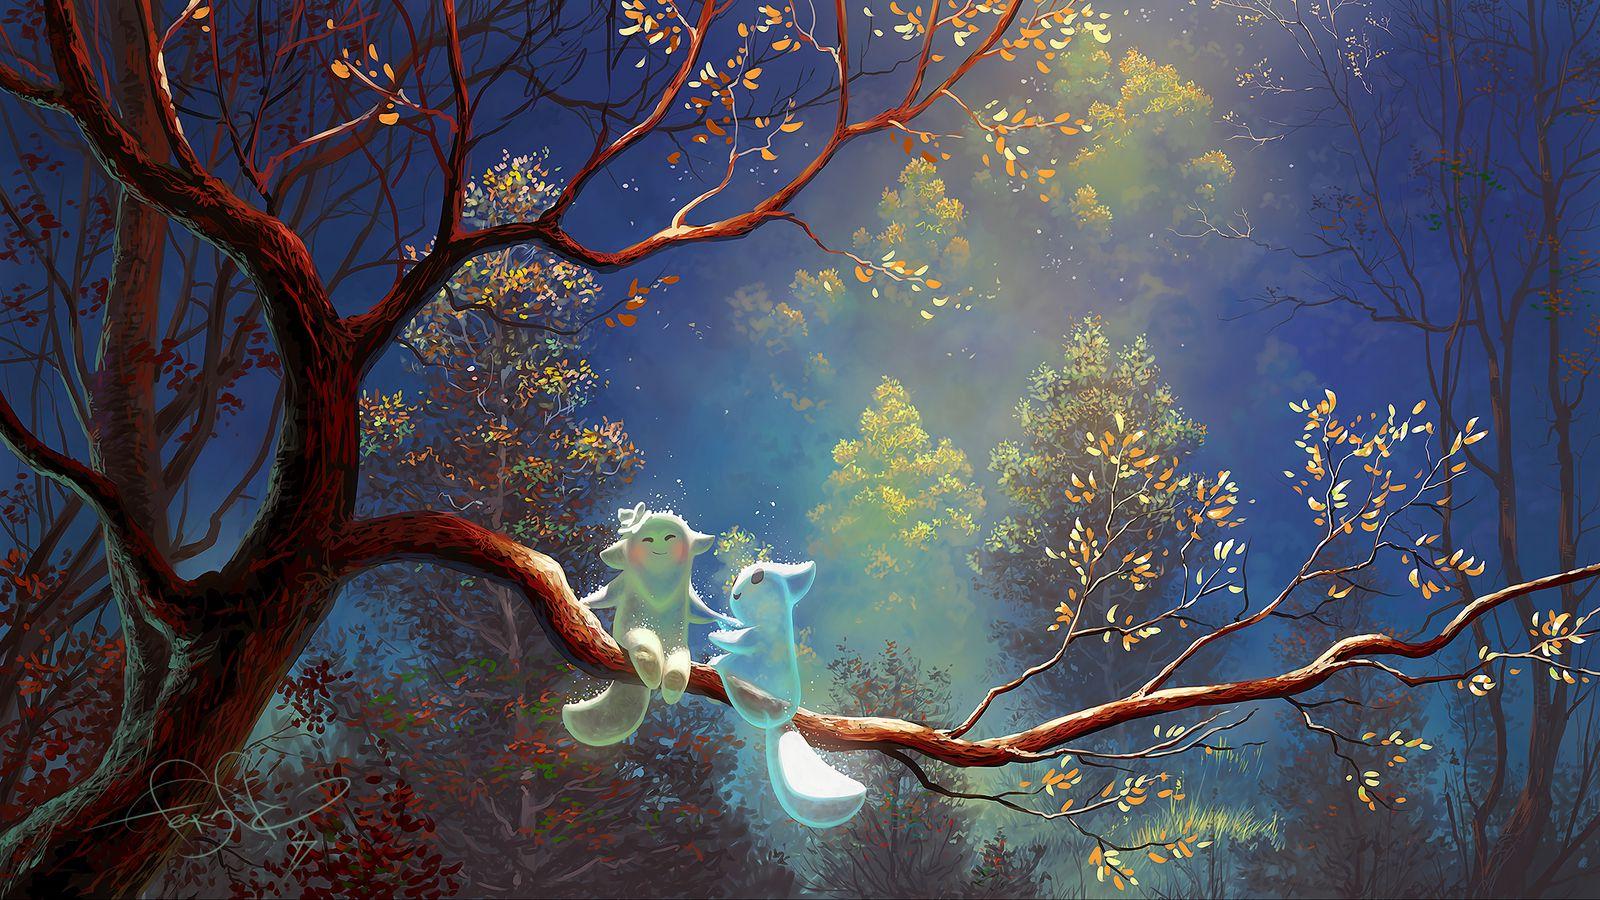 1600x900 Wallpaper animals, tree, branch, magic, art, fantasy